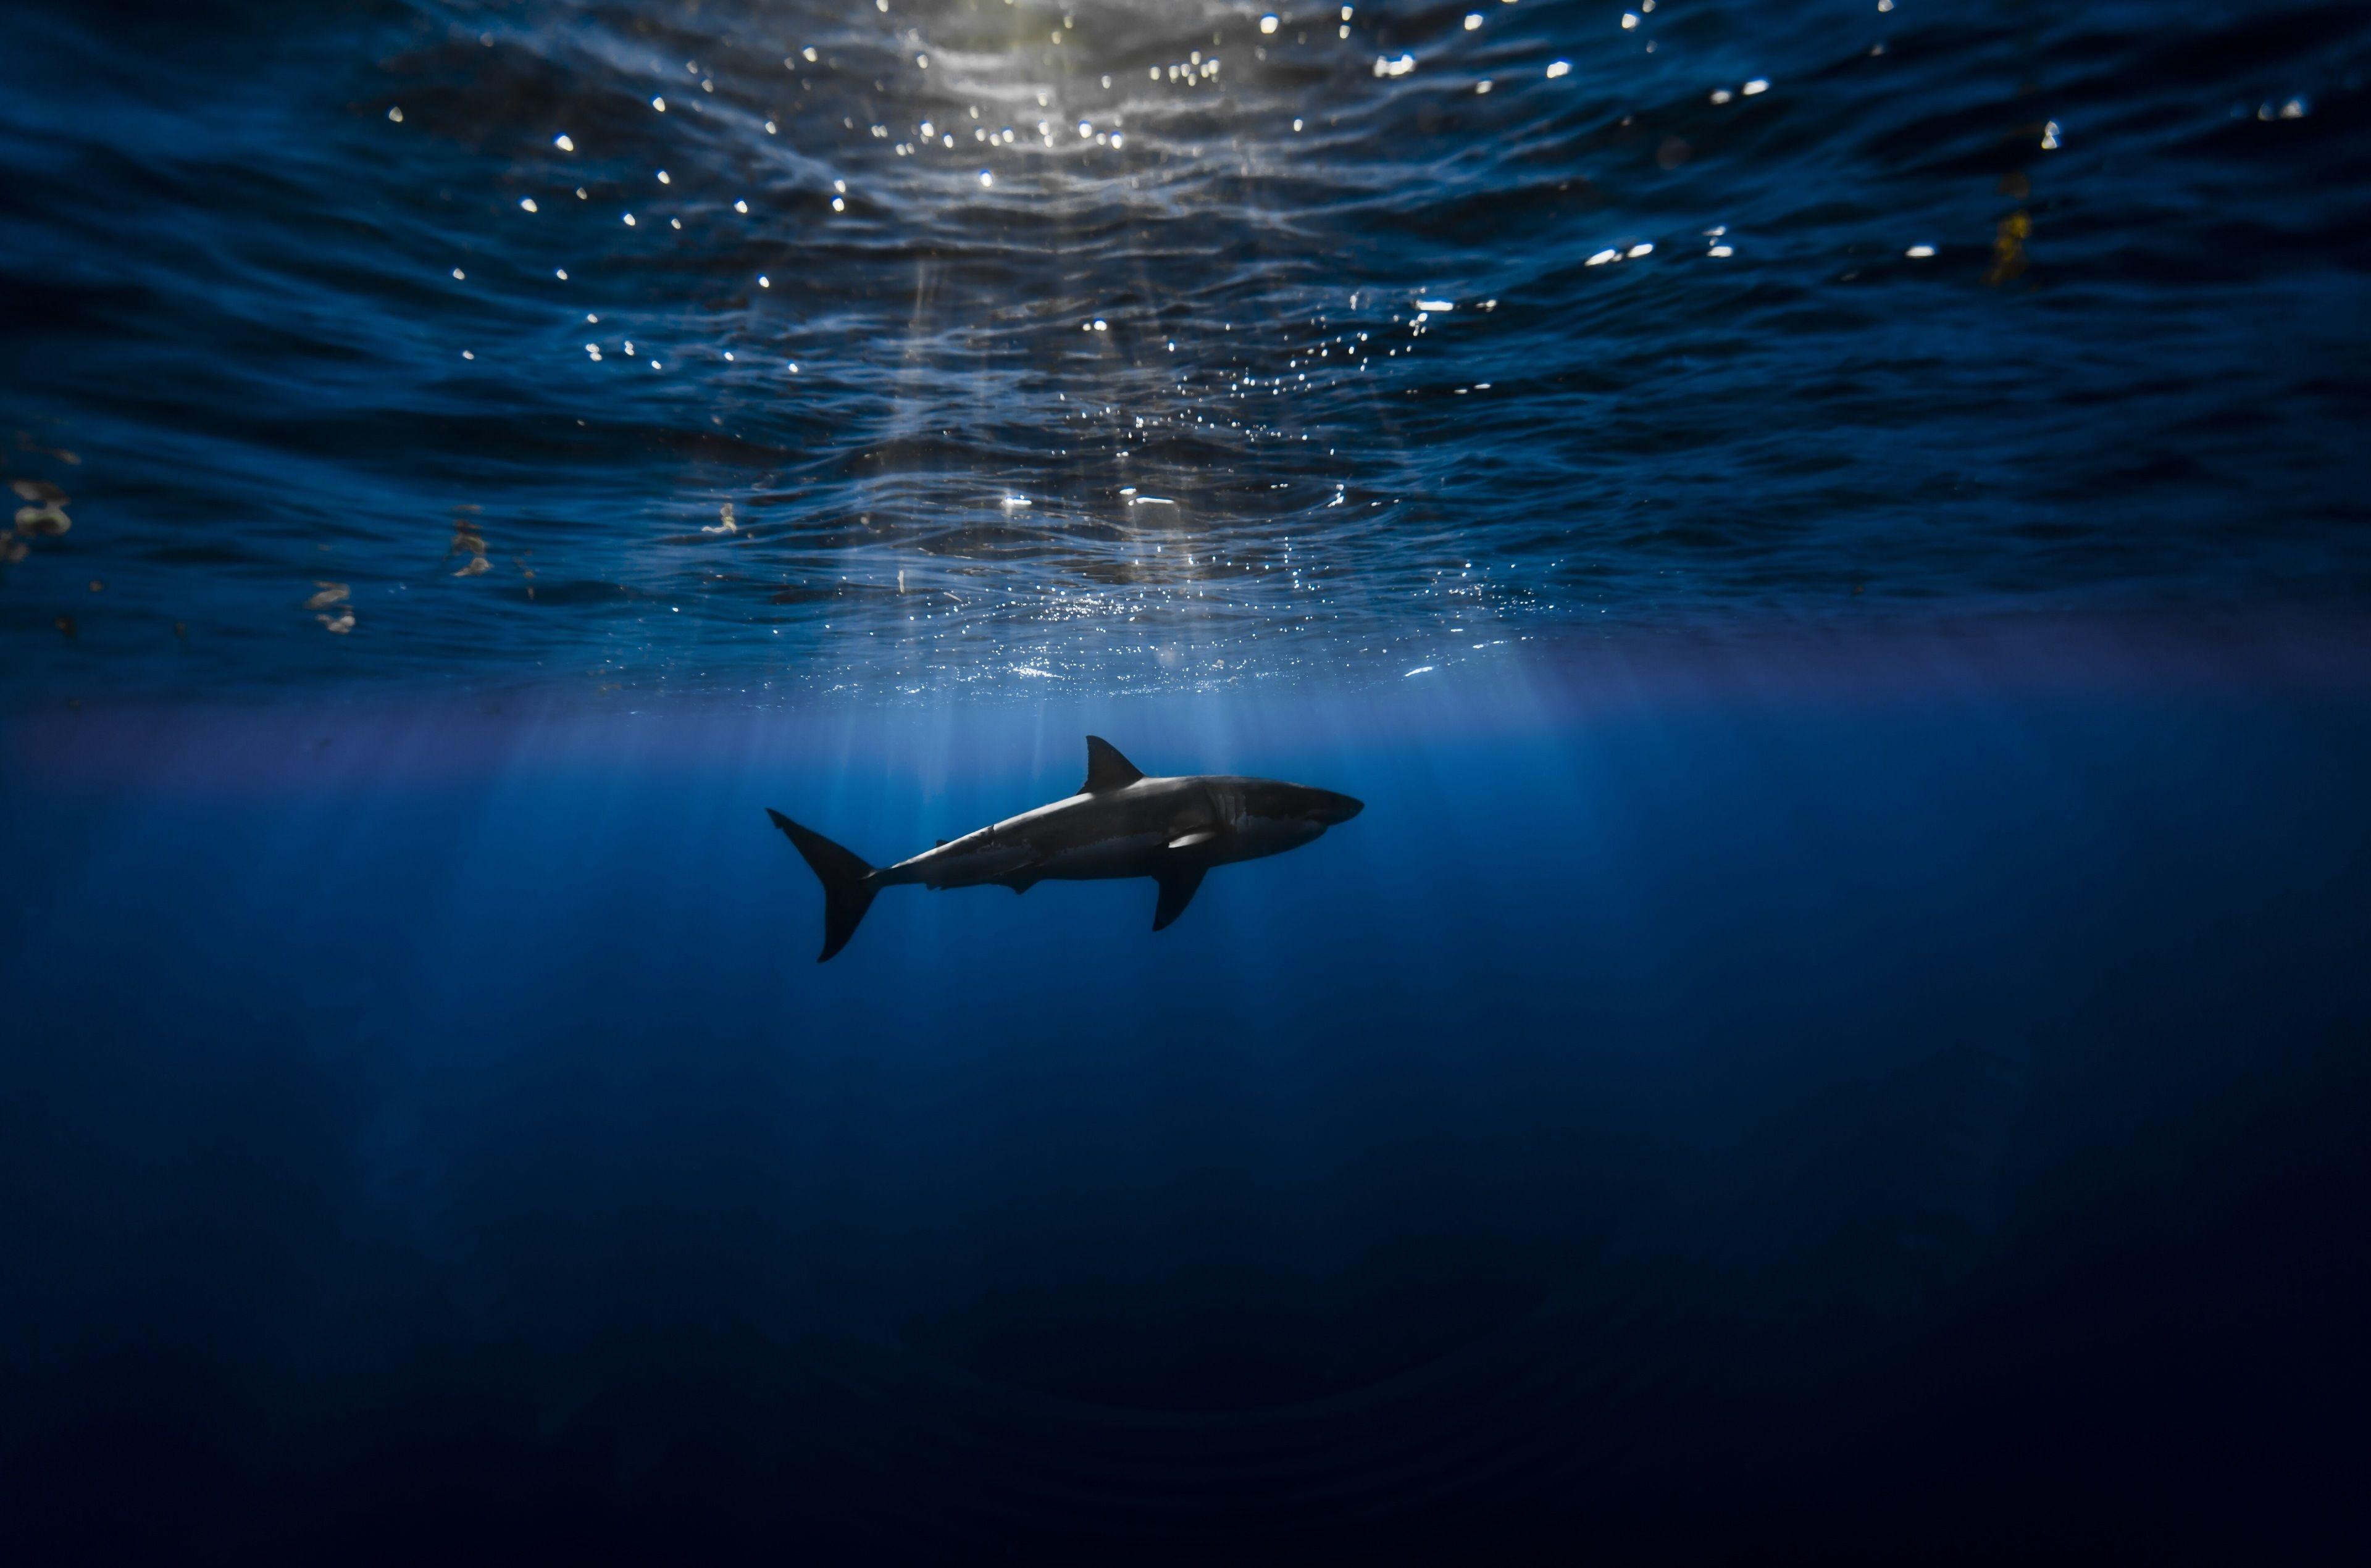 3840x2540 Shark 4k Pc Wallpaper Hd Quality Underwater Wallpaper Ocean Underwater Great White Shark